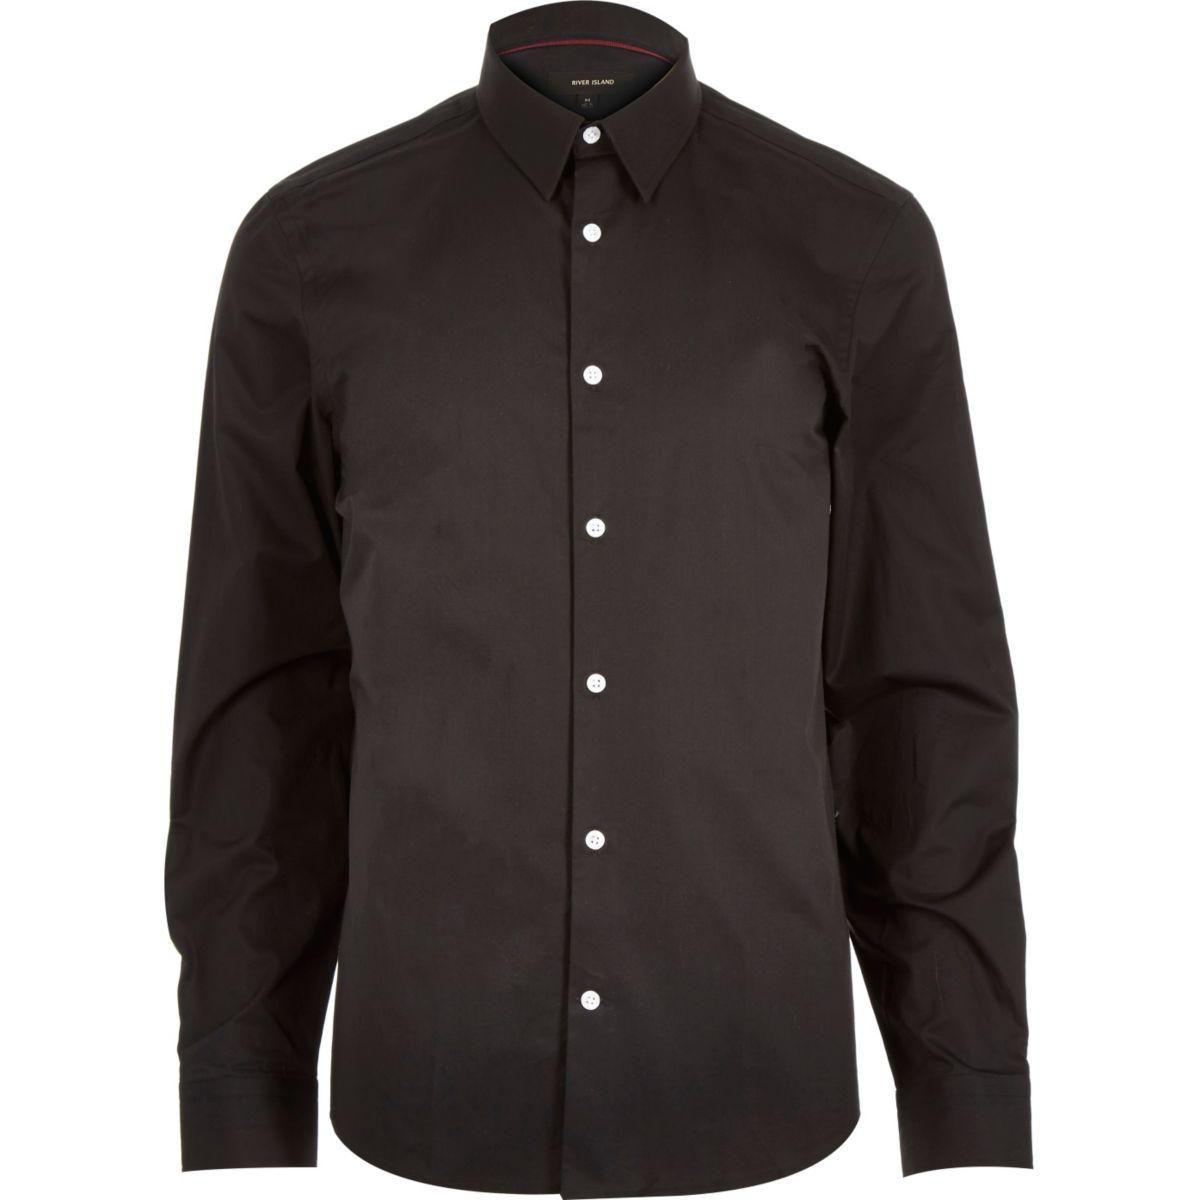 Black Slim Fit Shirt Shirts Sale Men